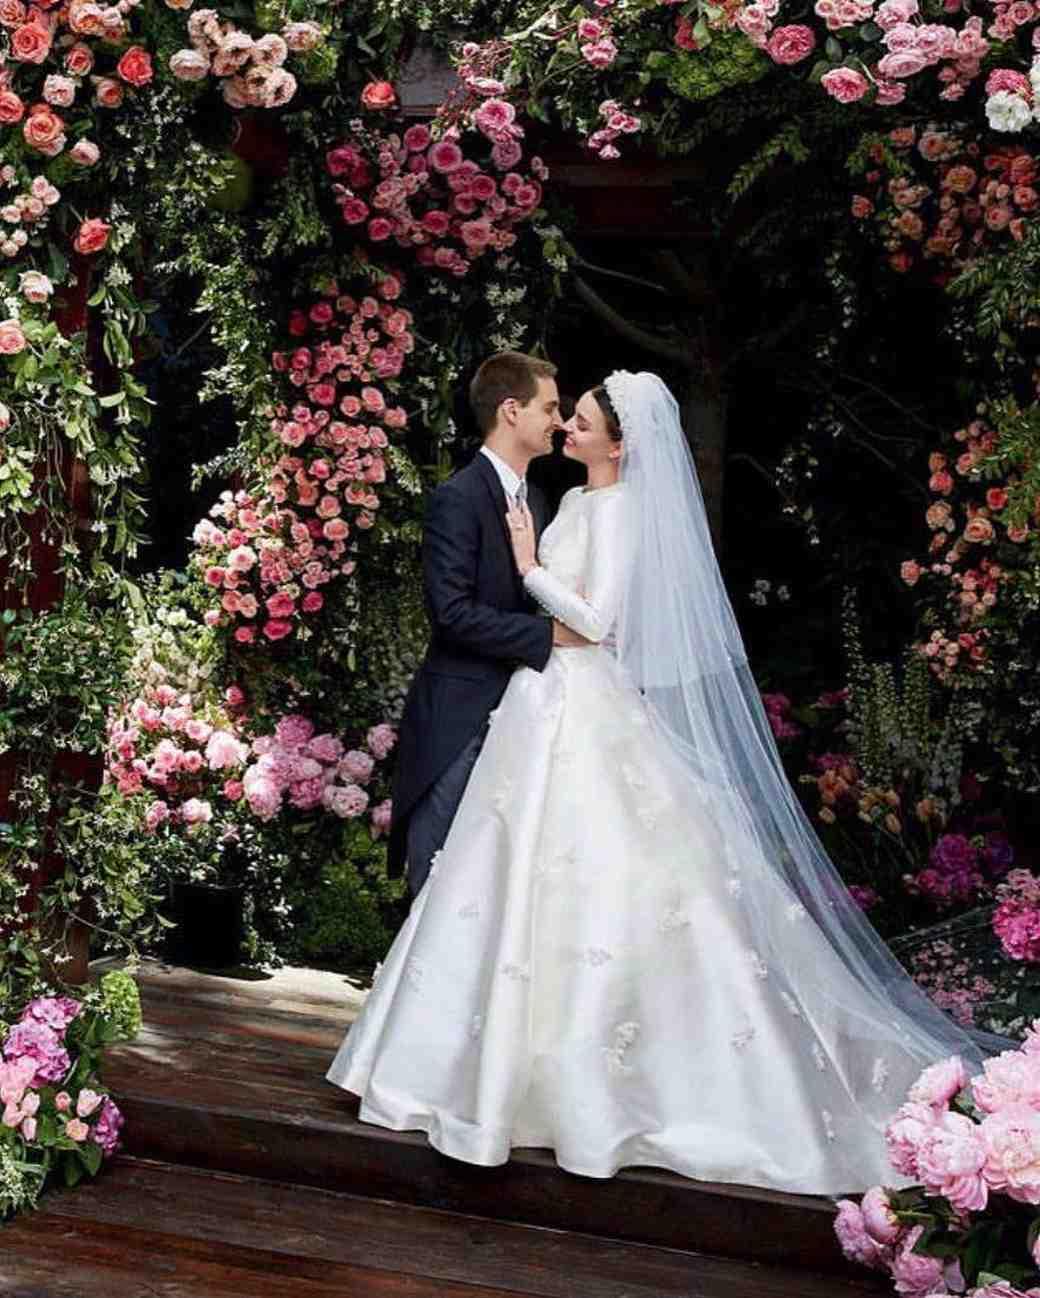 Miranda Kerr and Evan Spiegel at wedding